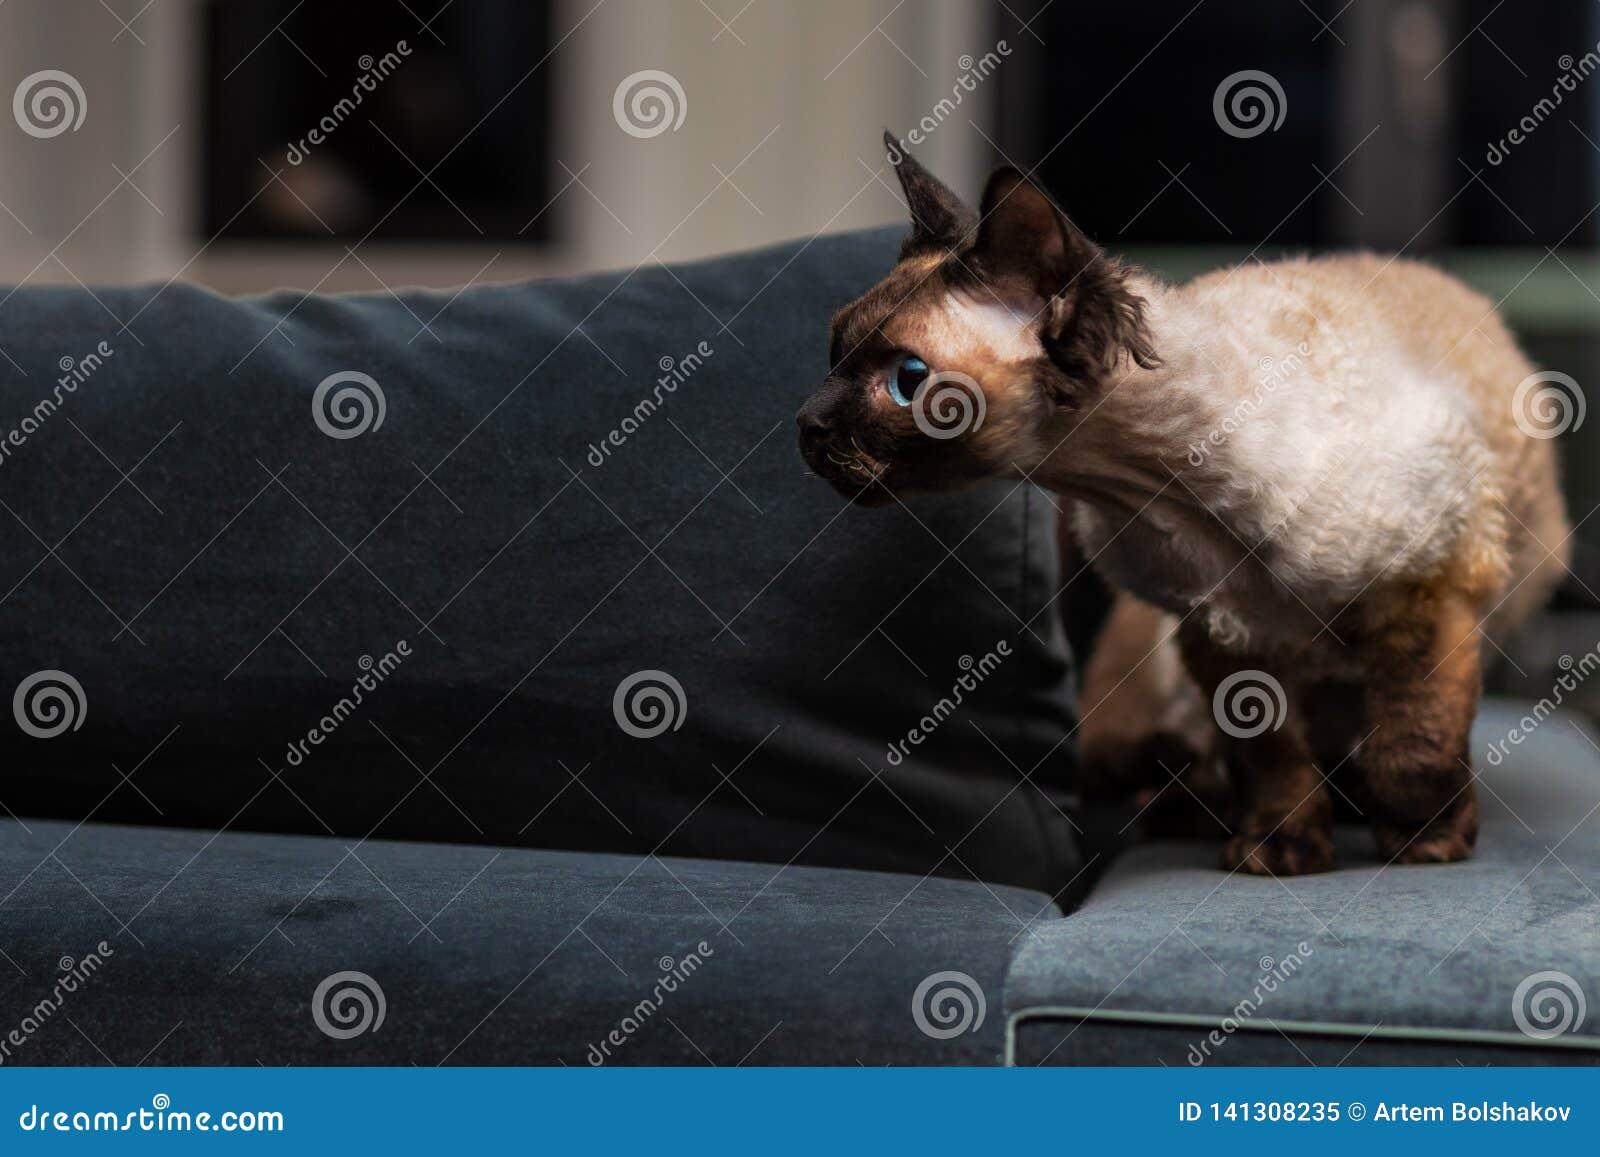 Beautiful Devon Rex cat Blu Point type In the home interior. Selective focus, bokeh